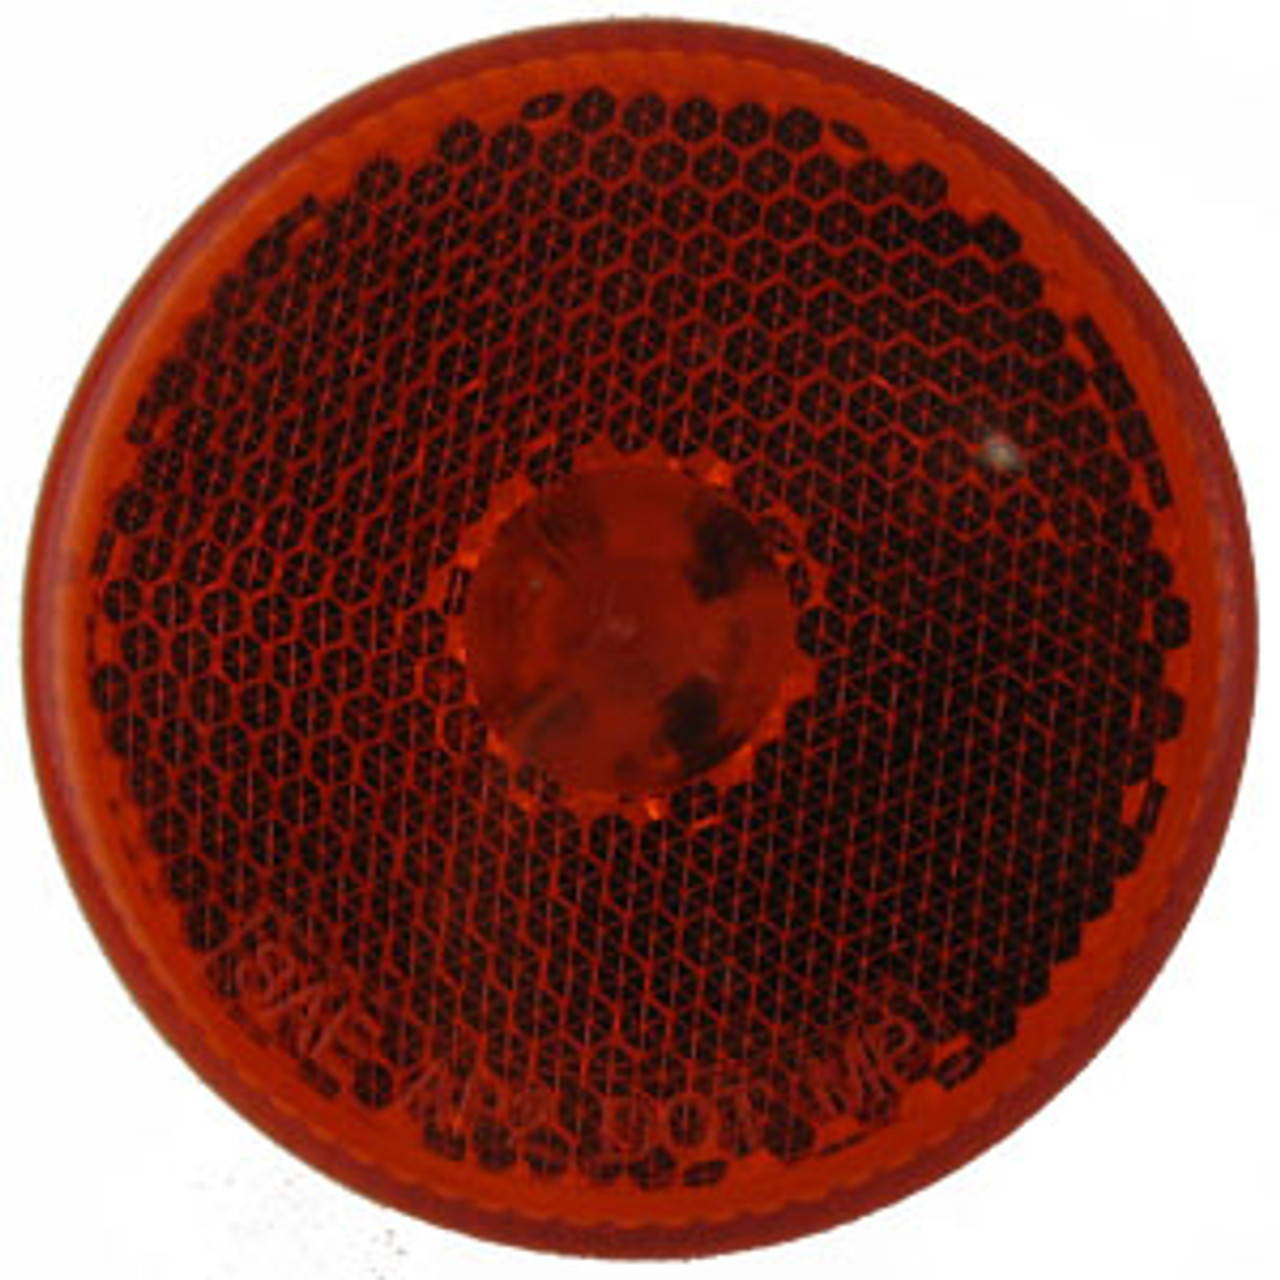 "2 1/2"" Red Incandescent Light"